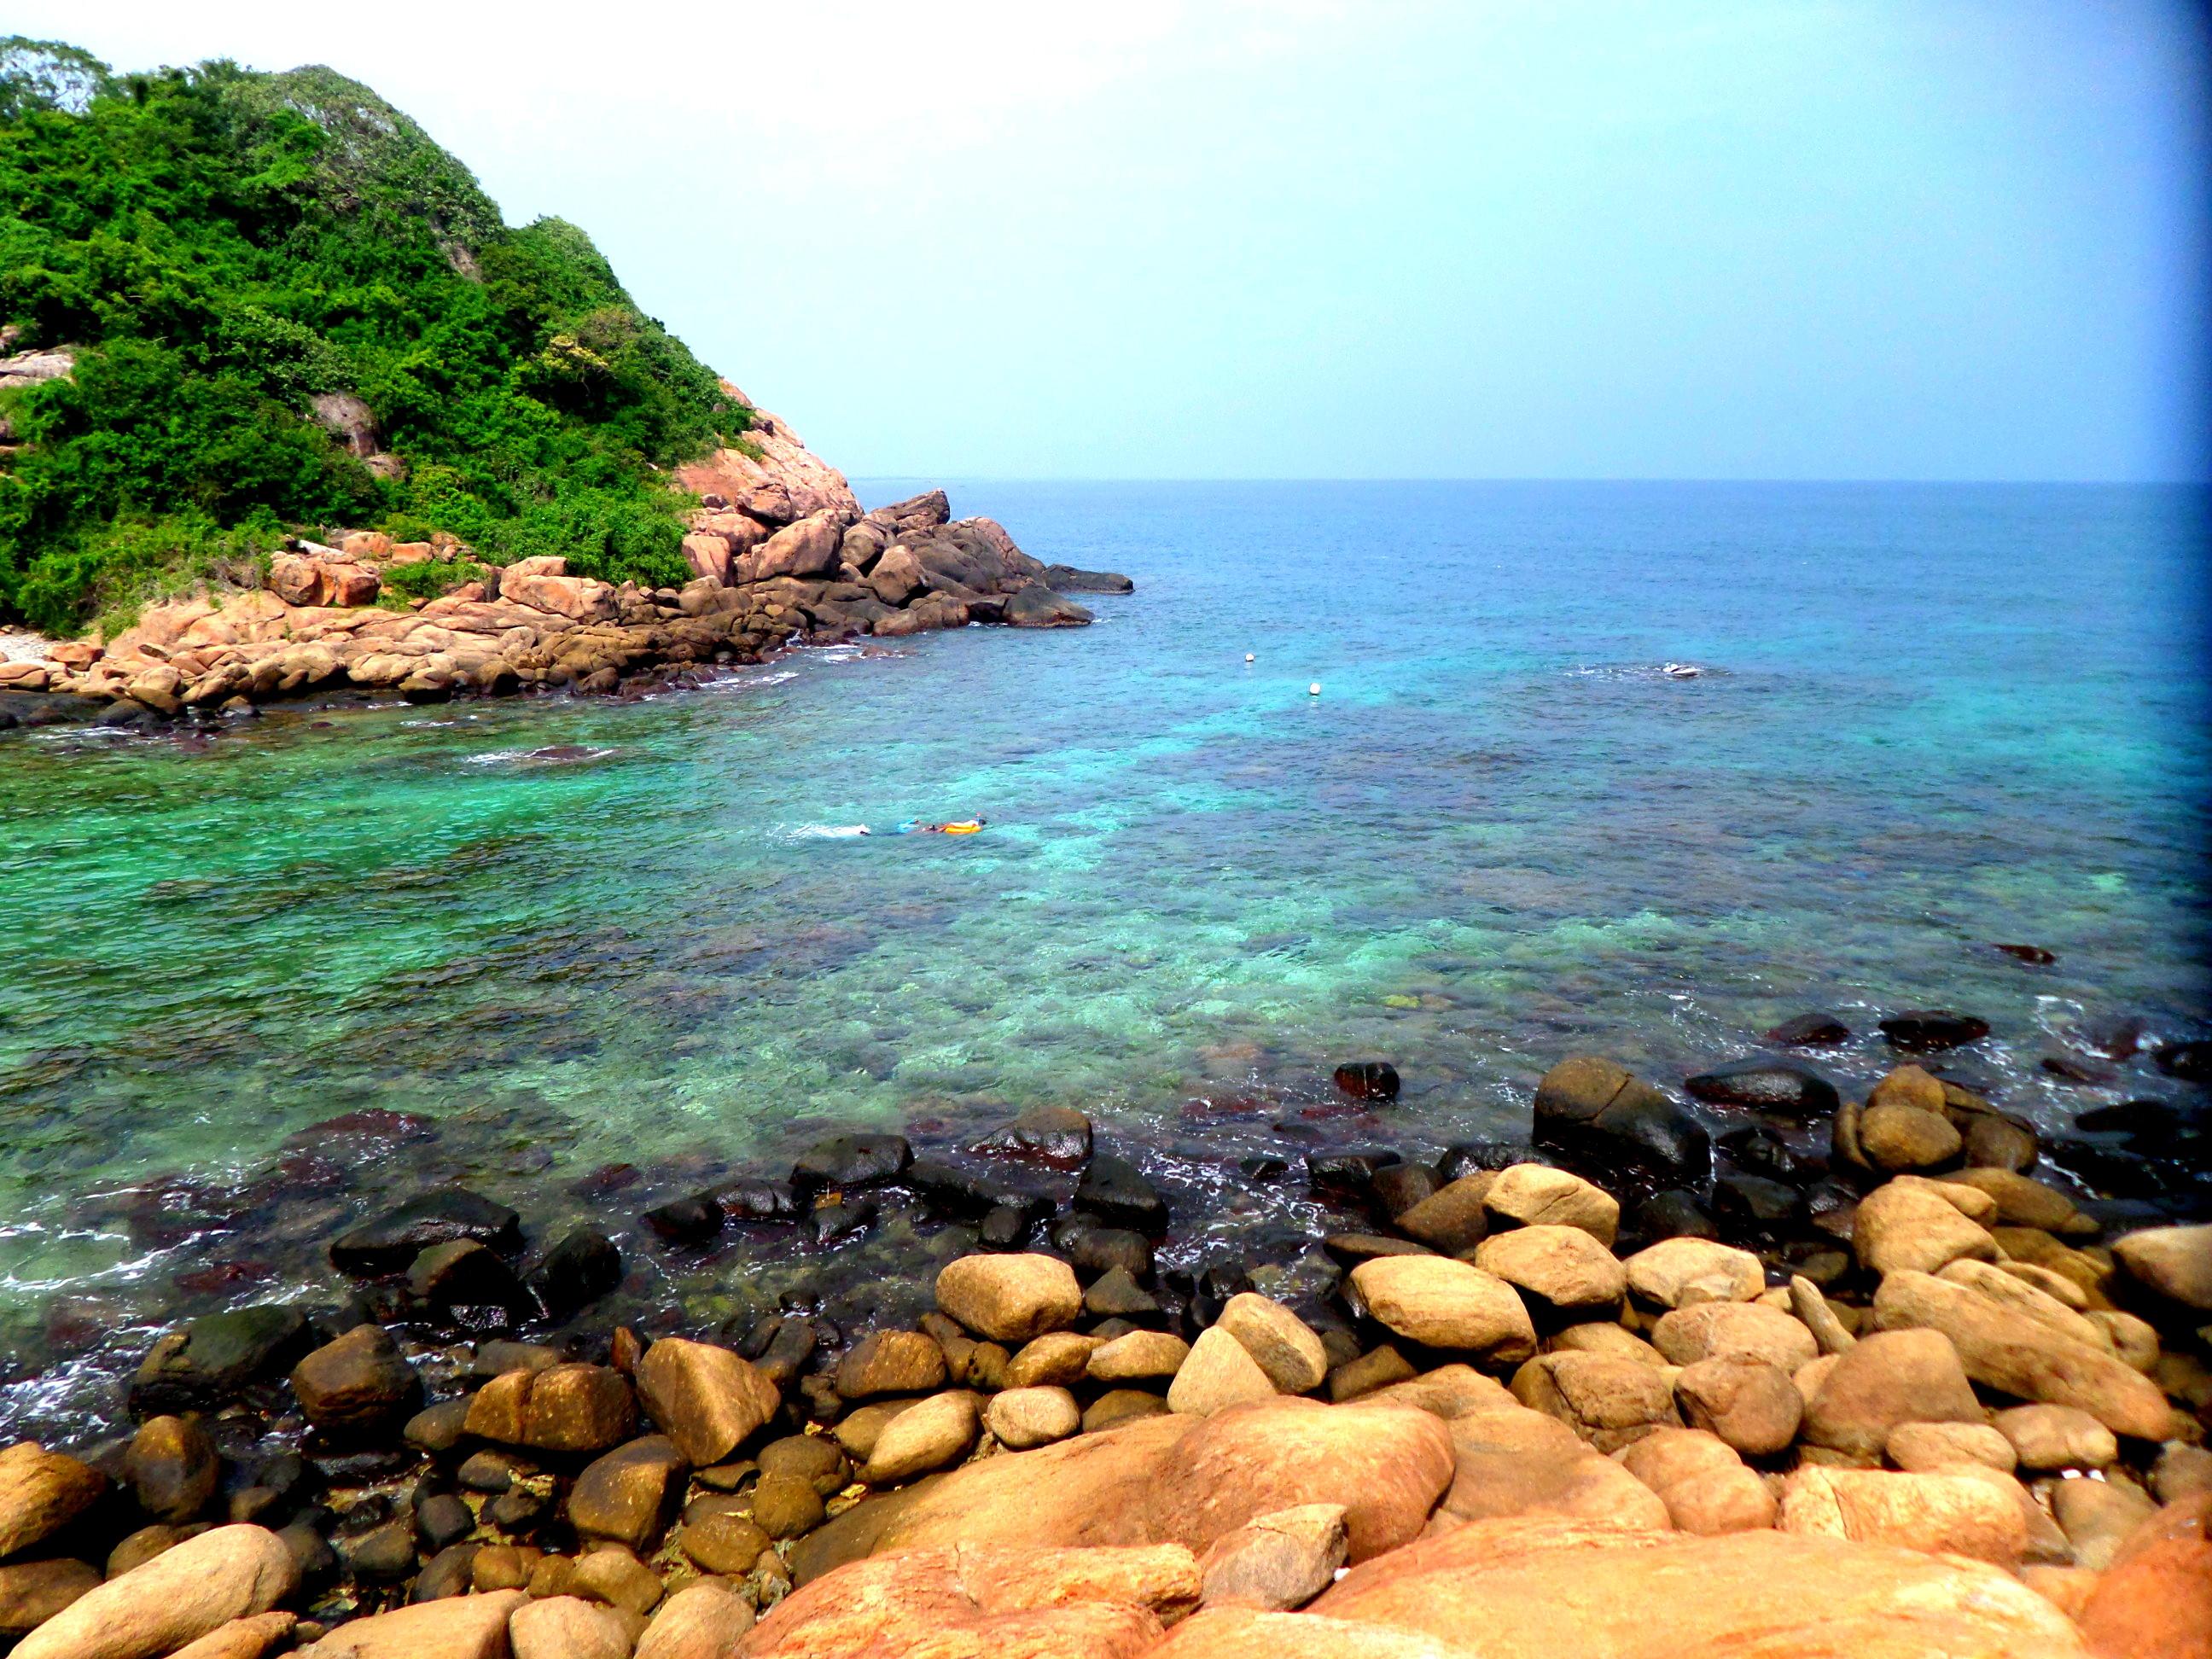 File:The Beauty of Pigeon Island - Beautiful Ocean.jpg - Wikimedia Commons